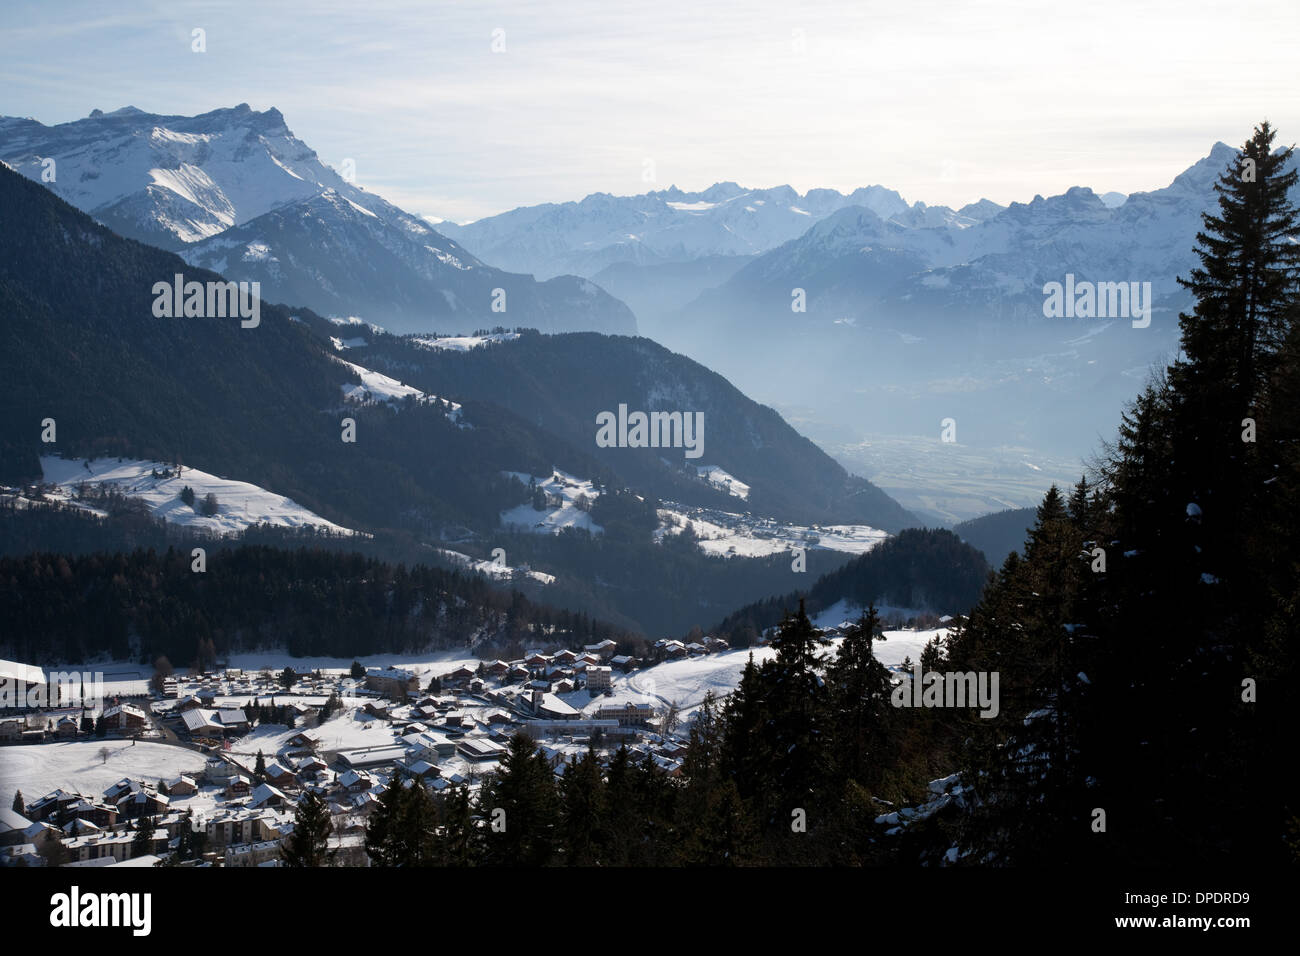 Alpine skiing village of Leysin at 1350m, Swiss Alps, Vaud, Switzerland Europe - Stock Image